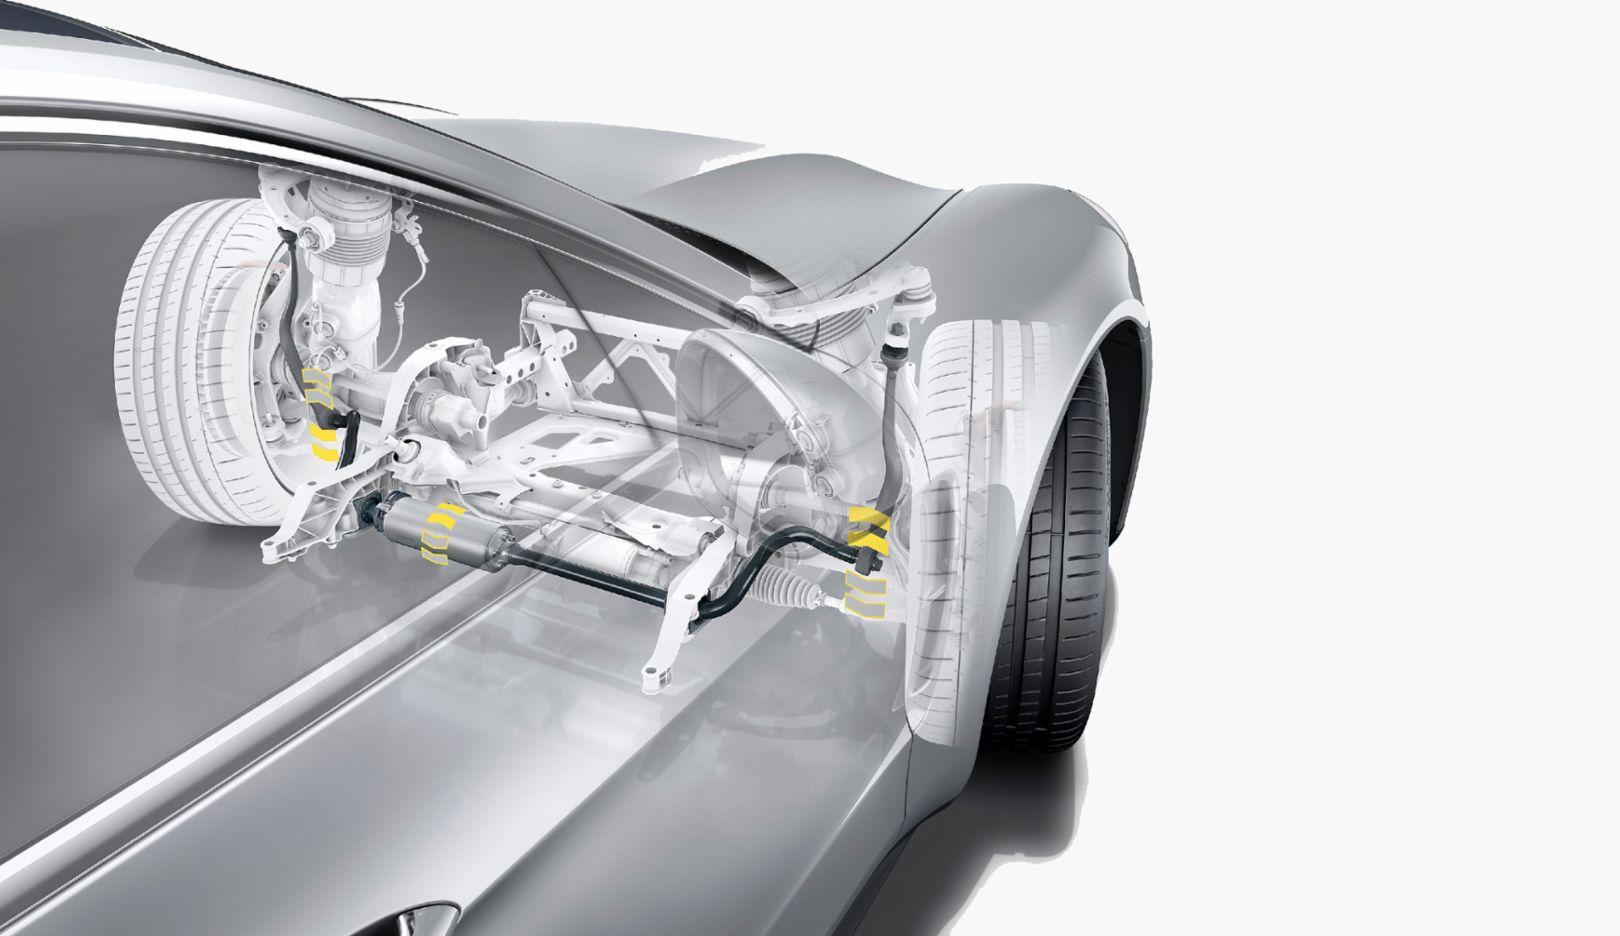 PDCC Sport-Stabilisator, Panamera, 2017, Porsche AG